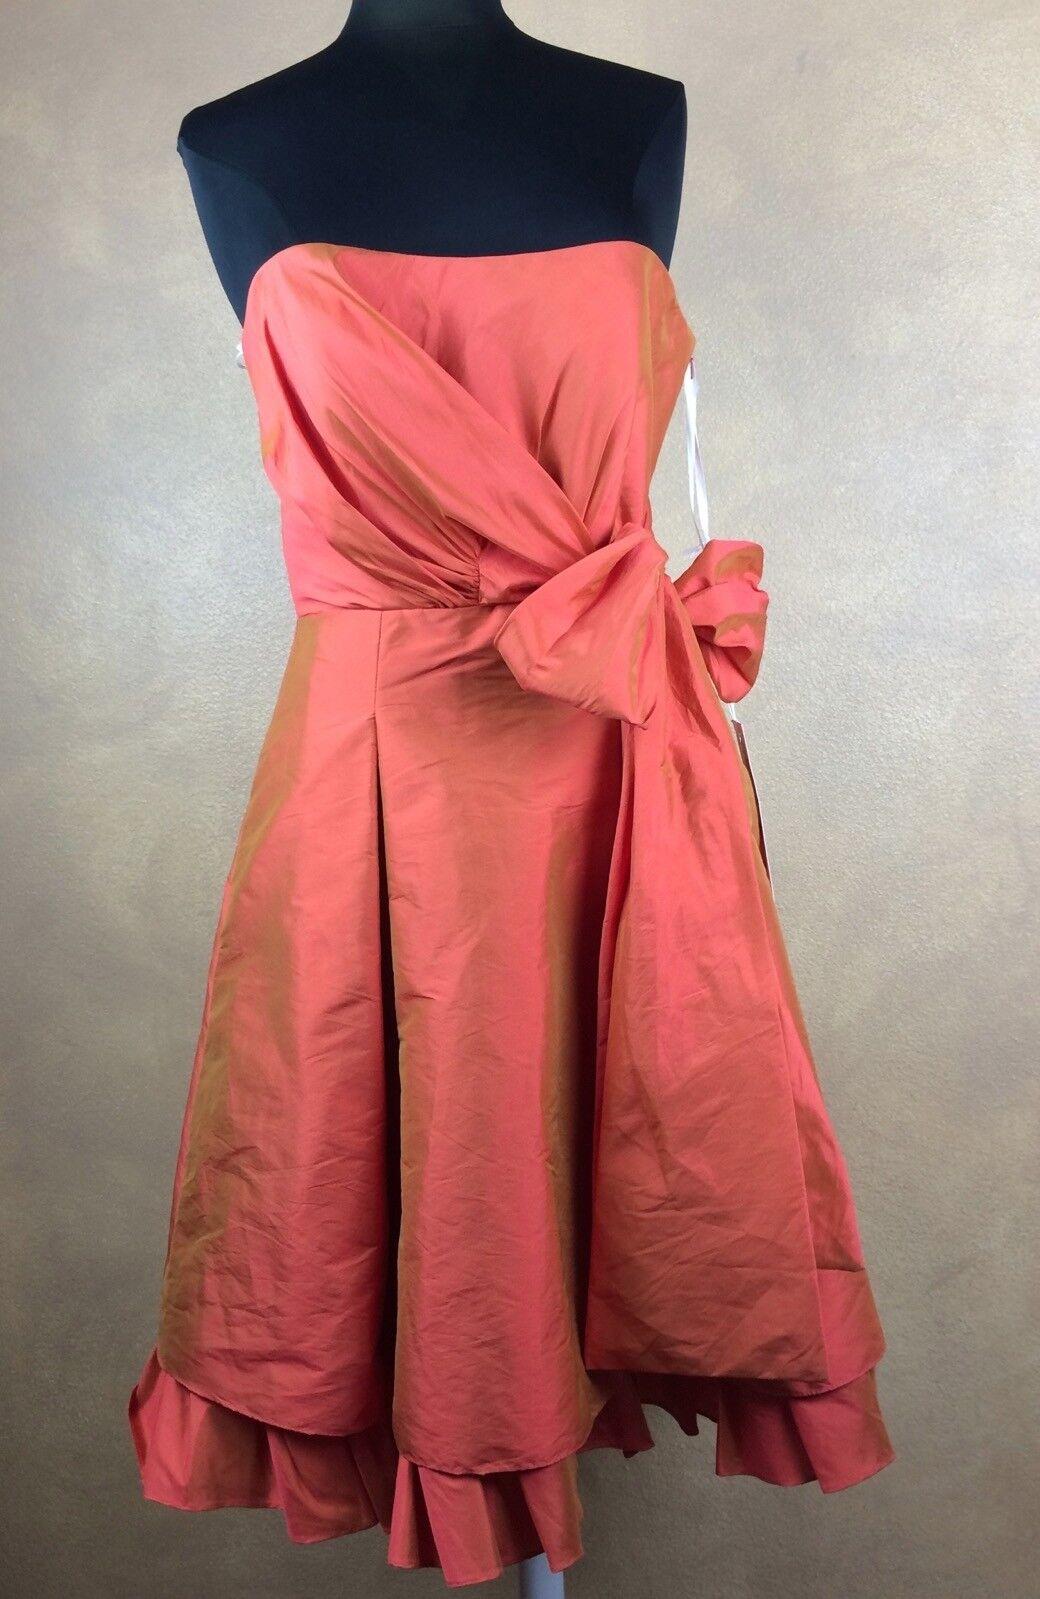 JIM HJELM OCCASIONS Orange w Grün Taffeta Dress Prom Bridesmaid 12 Retail